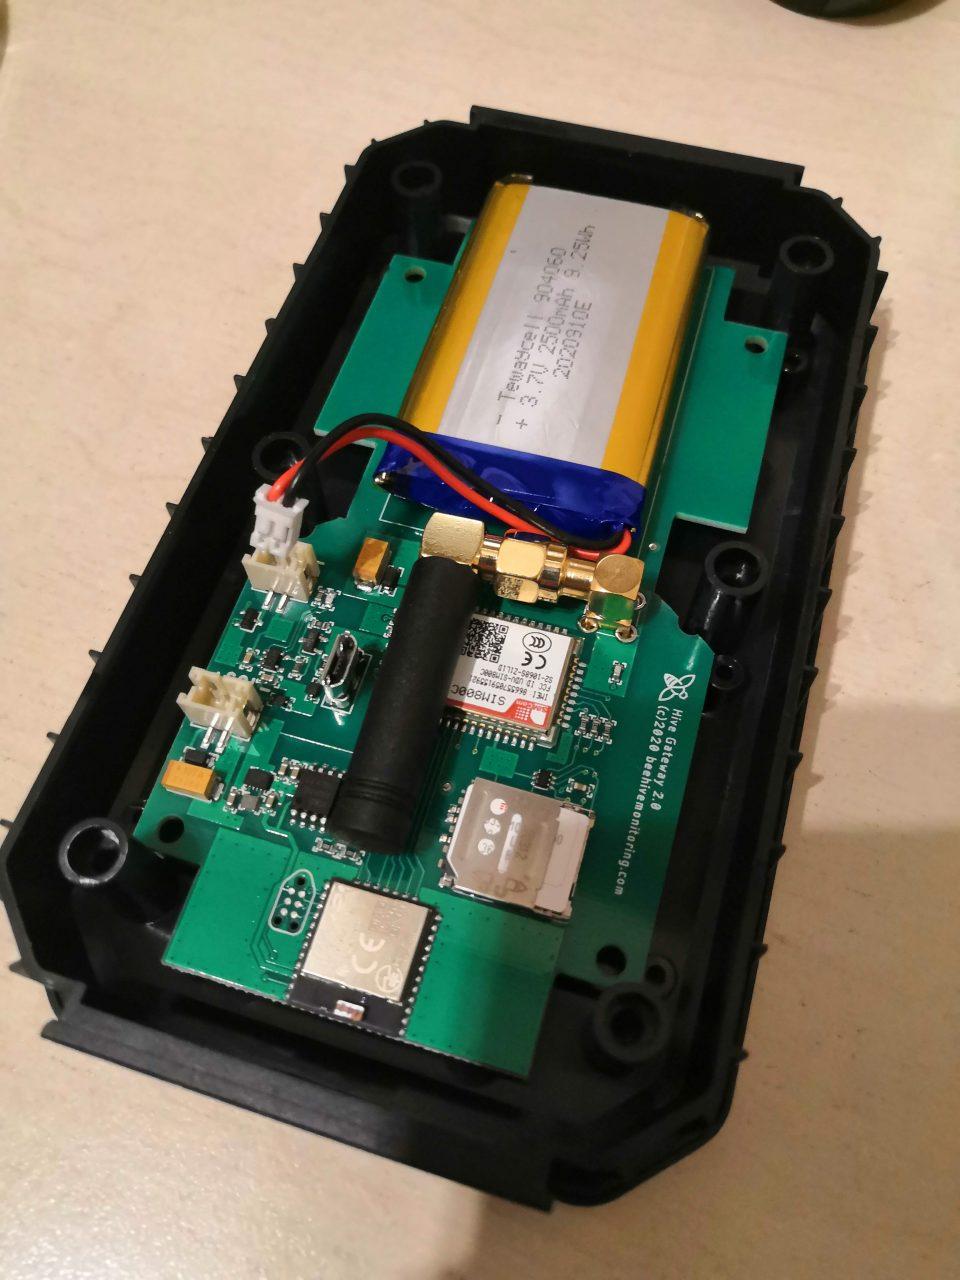 controller gsm gateway aperto con sim